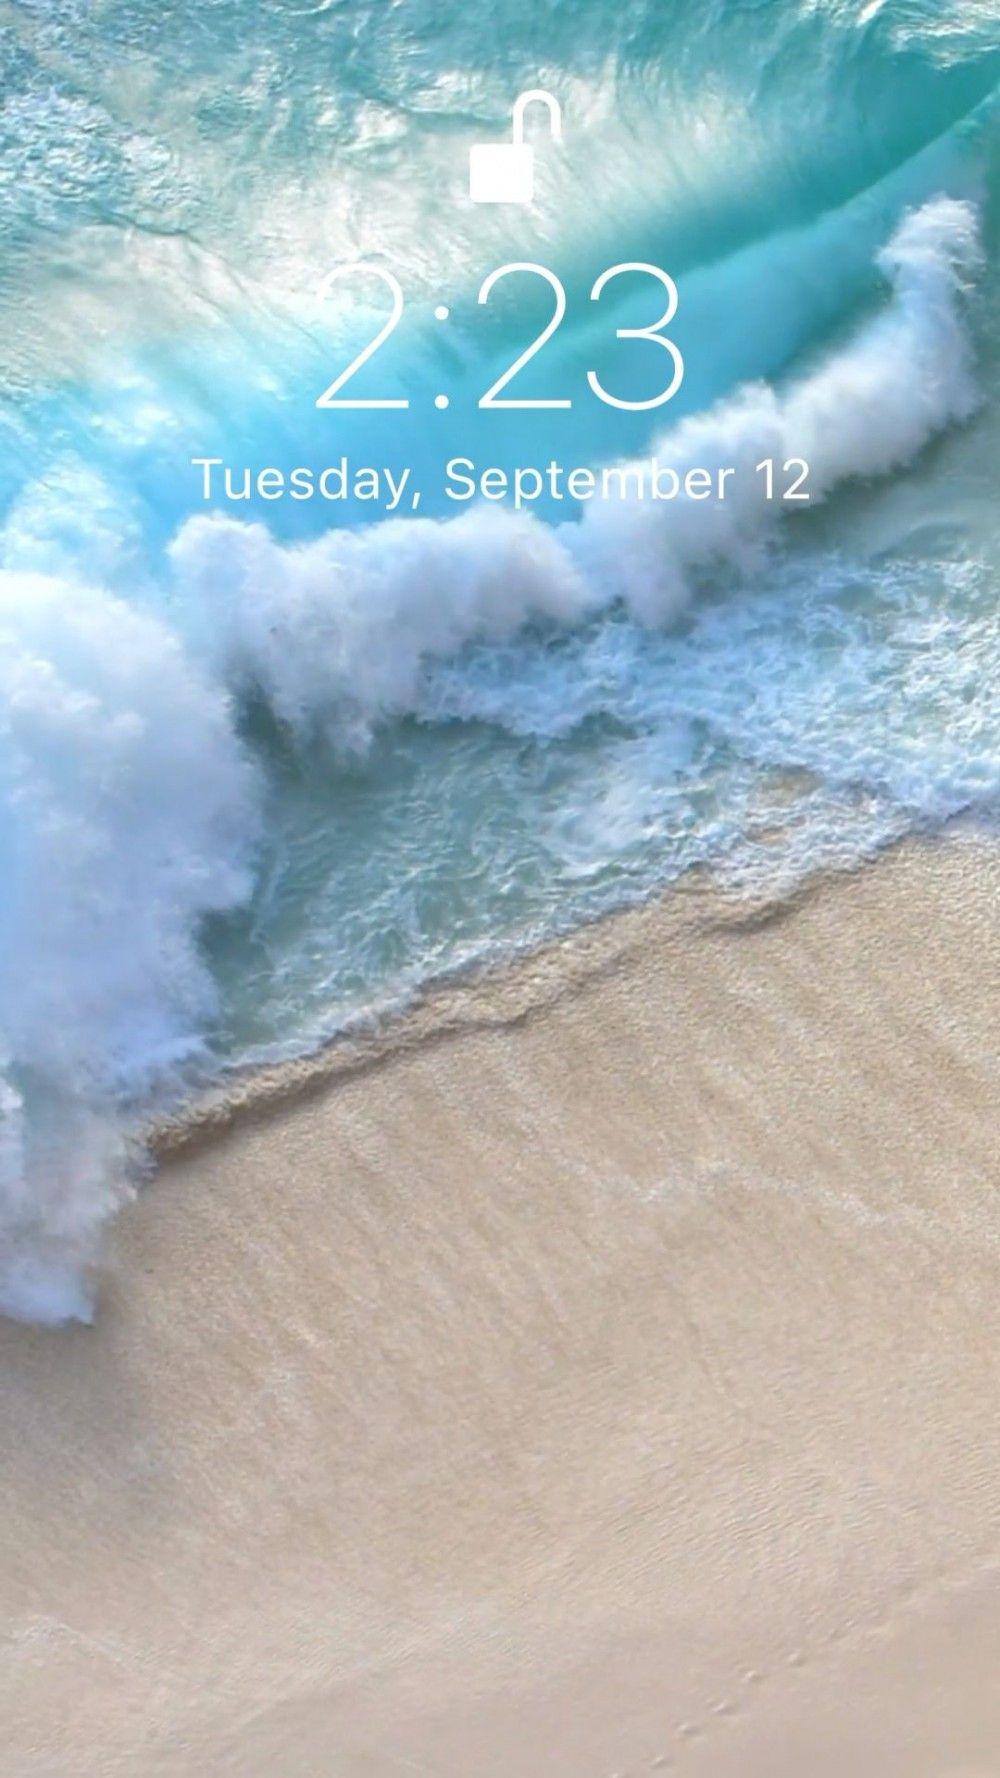 Fond D Ecran Ocean Ocean Wallpaper Waves Wallpaper Iphone Iphone Lockscreen Wallpaper